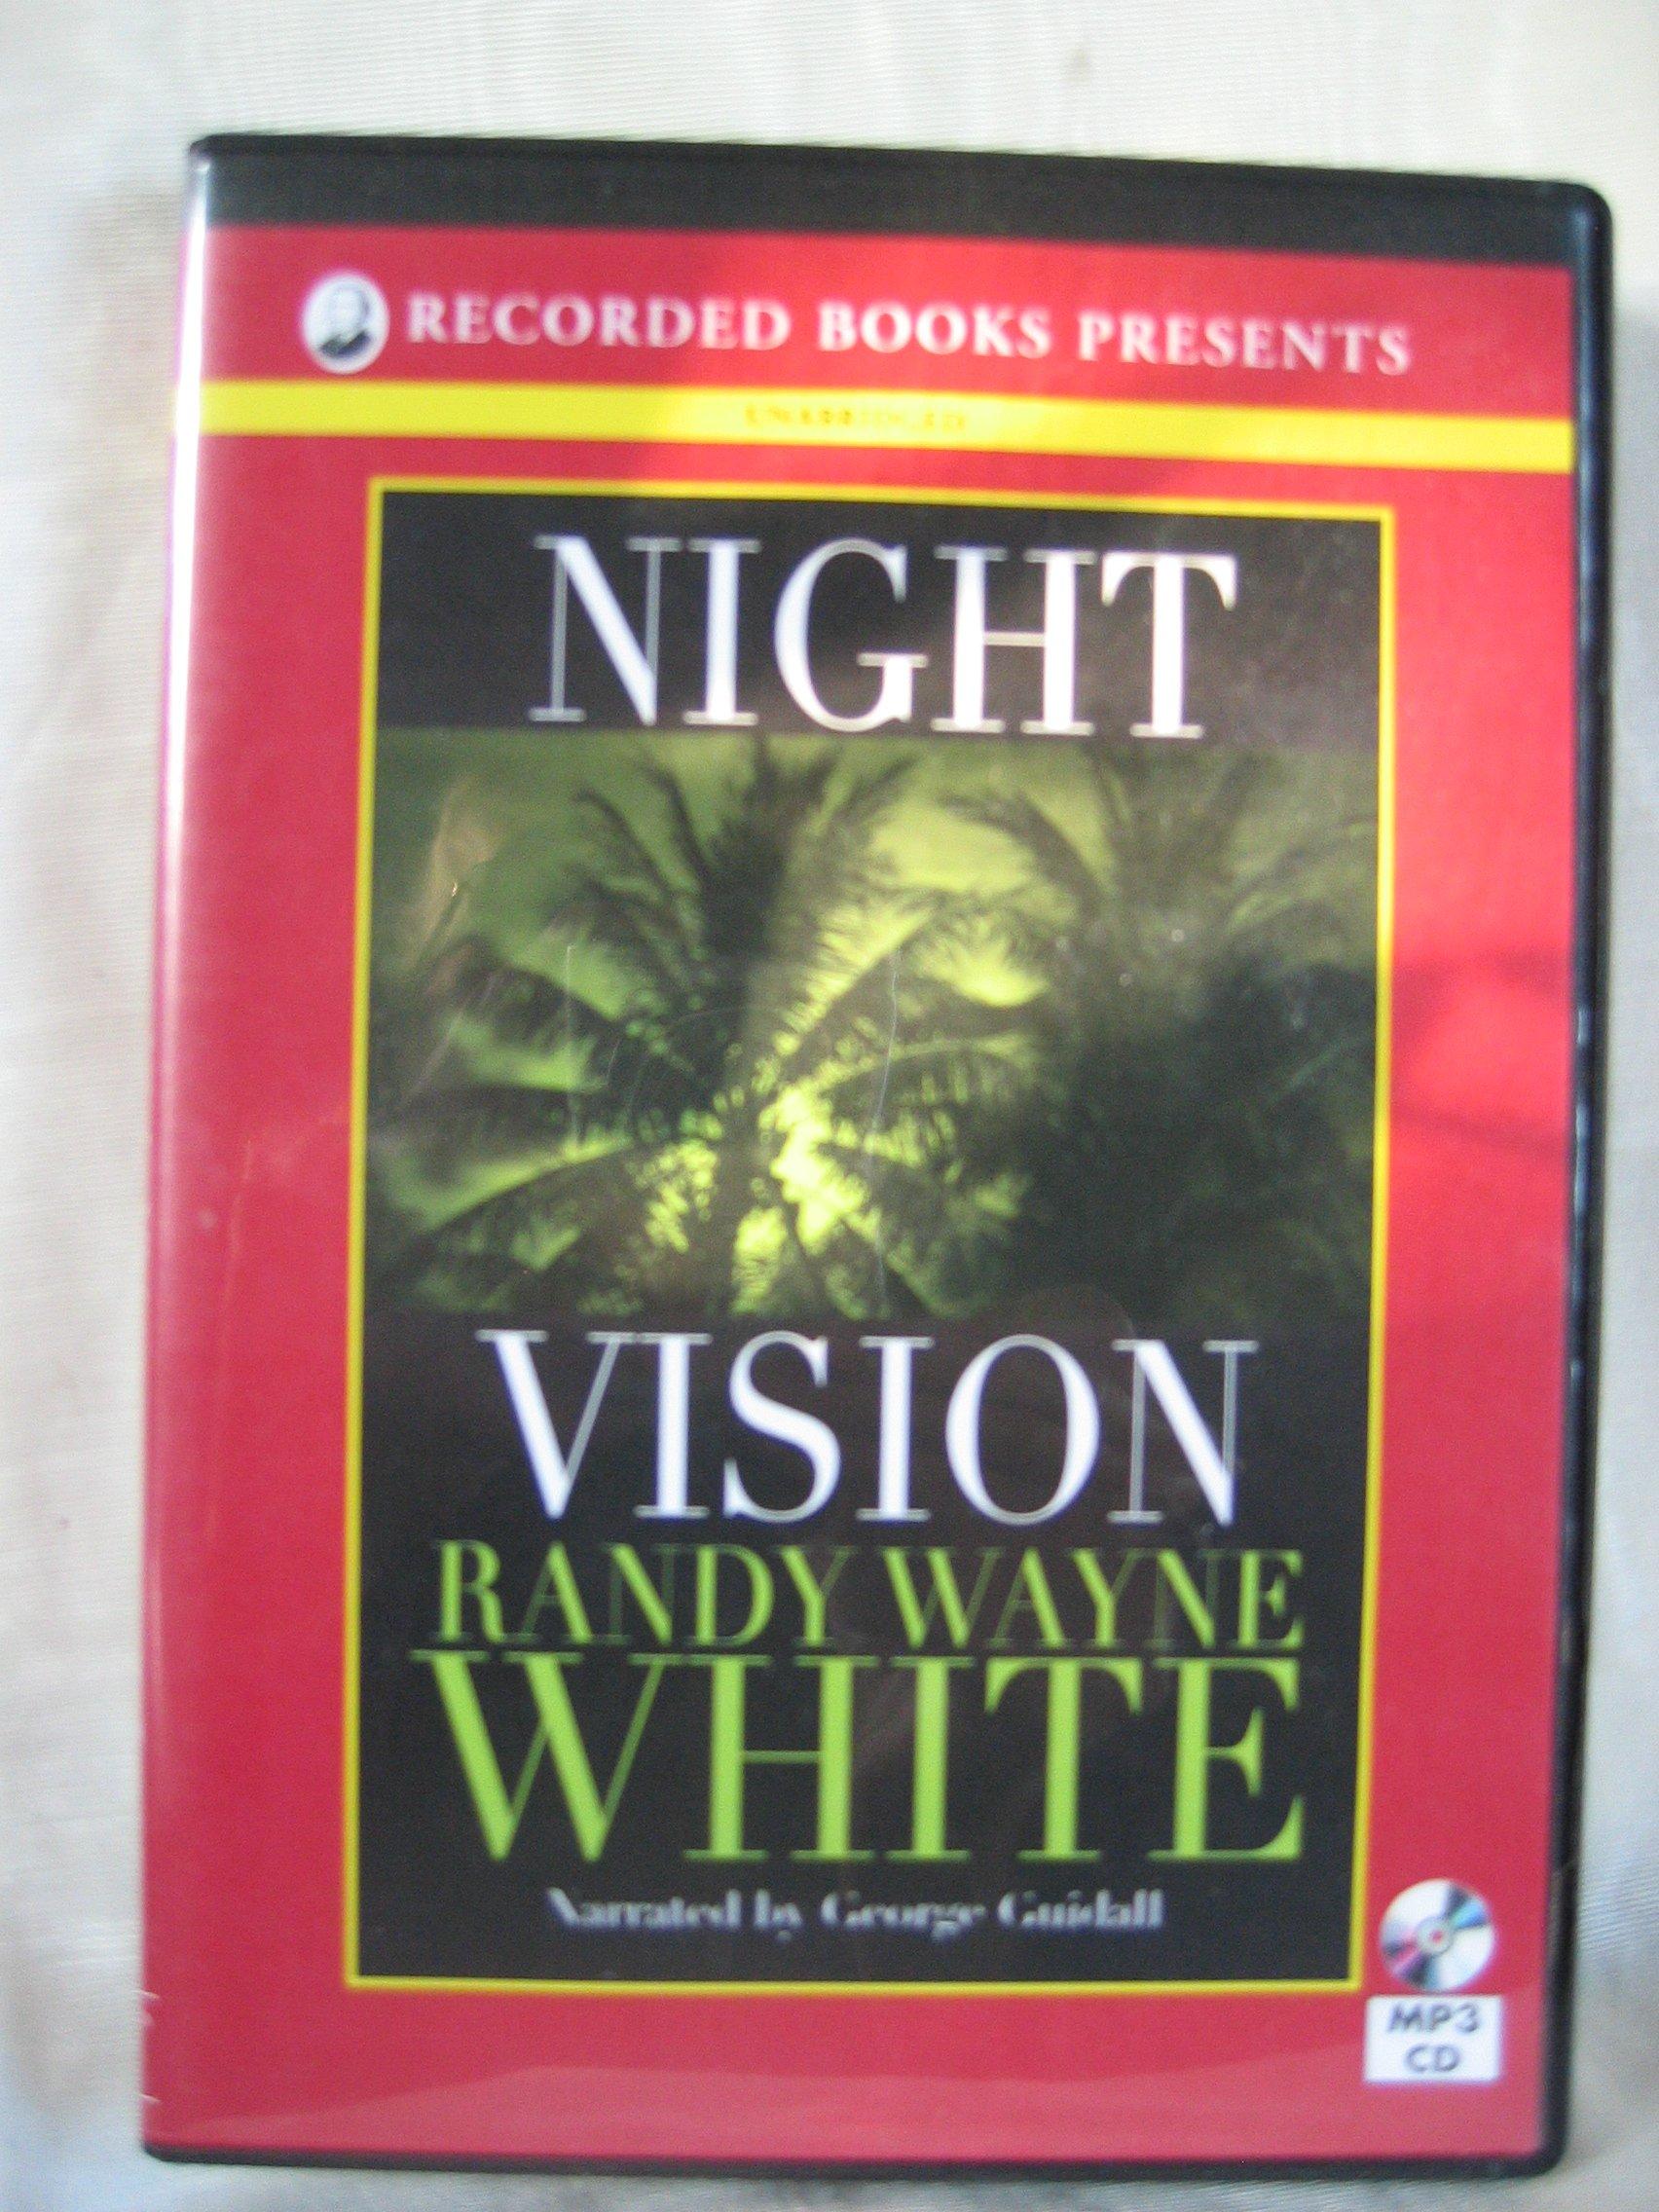 night vision white r andy wayne